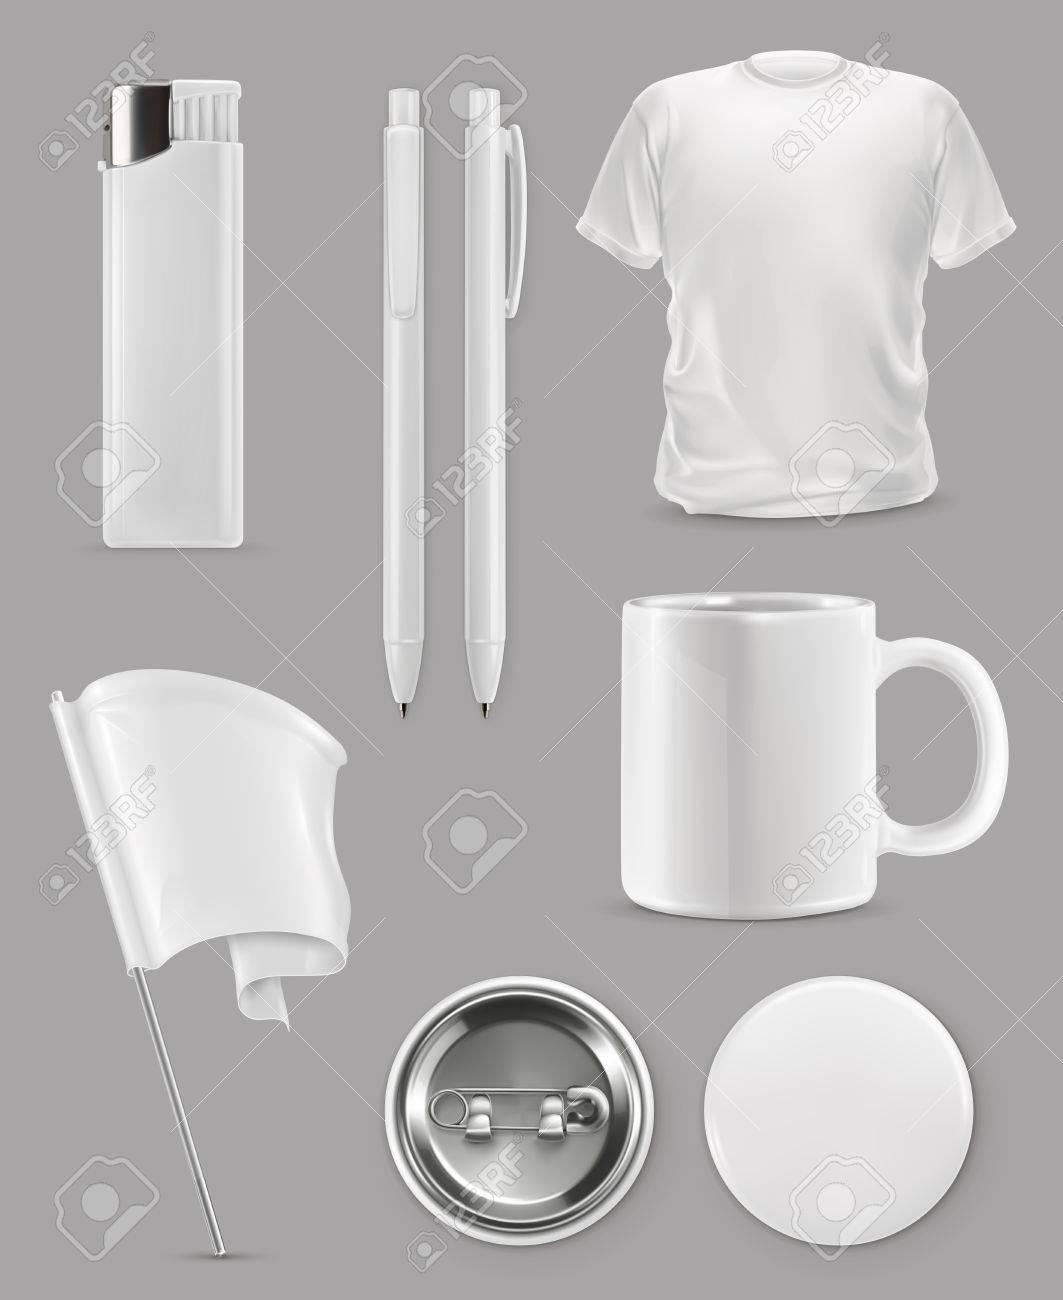 Promotional items, vector set mockup - 68712487